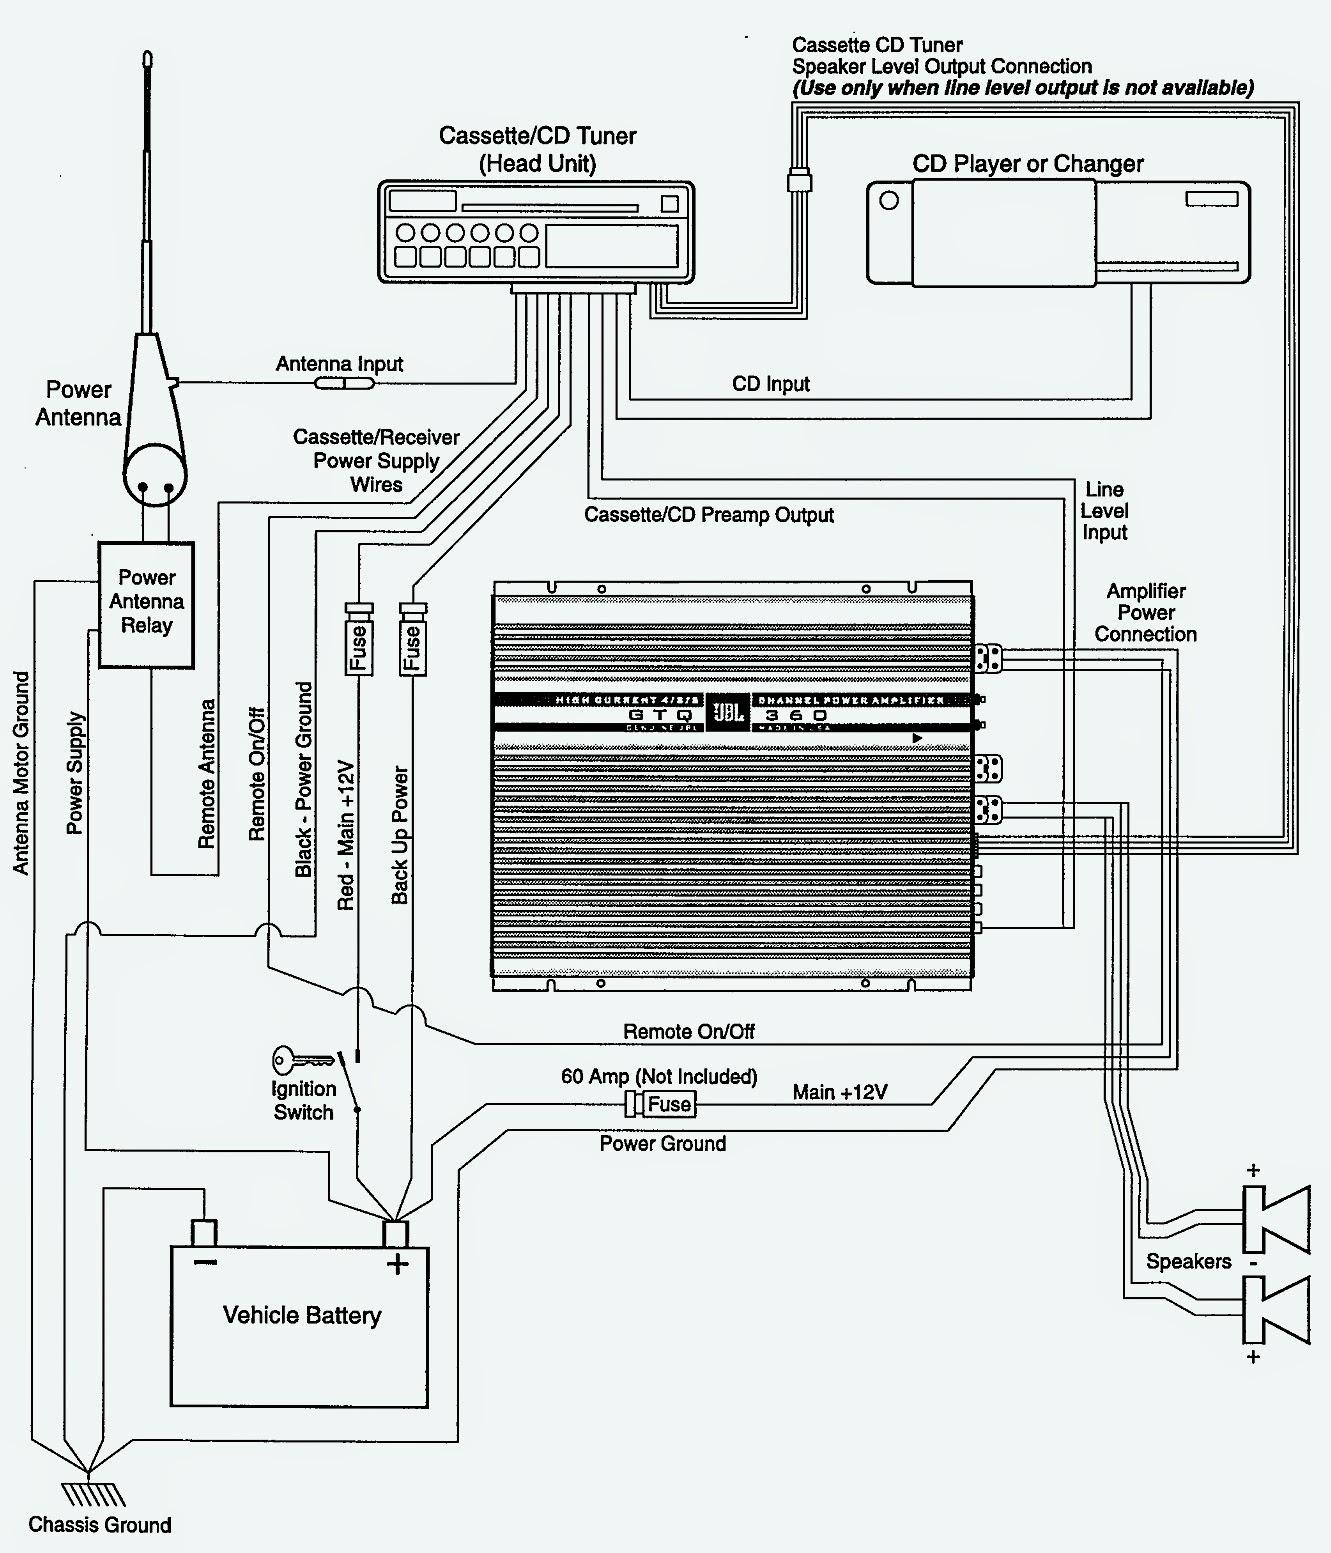 Toyota yaris radio wiring diagram gy6 wire diagram cat 3400 engine fantastic toyota tundra stereo wiring diagram photos everything wiring2bdiagram toyota tundra stereo wiring diagram toyota yaris radio wiring diagram asfbconference2016 Images